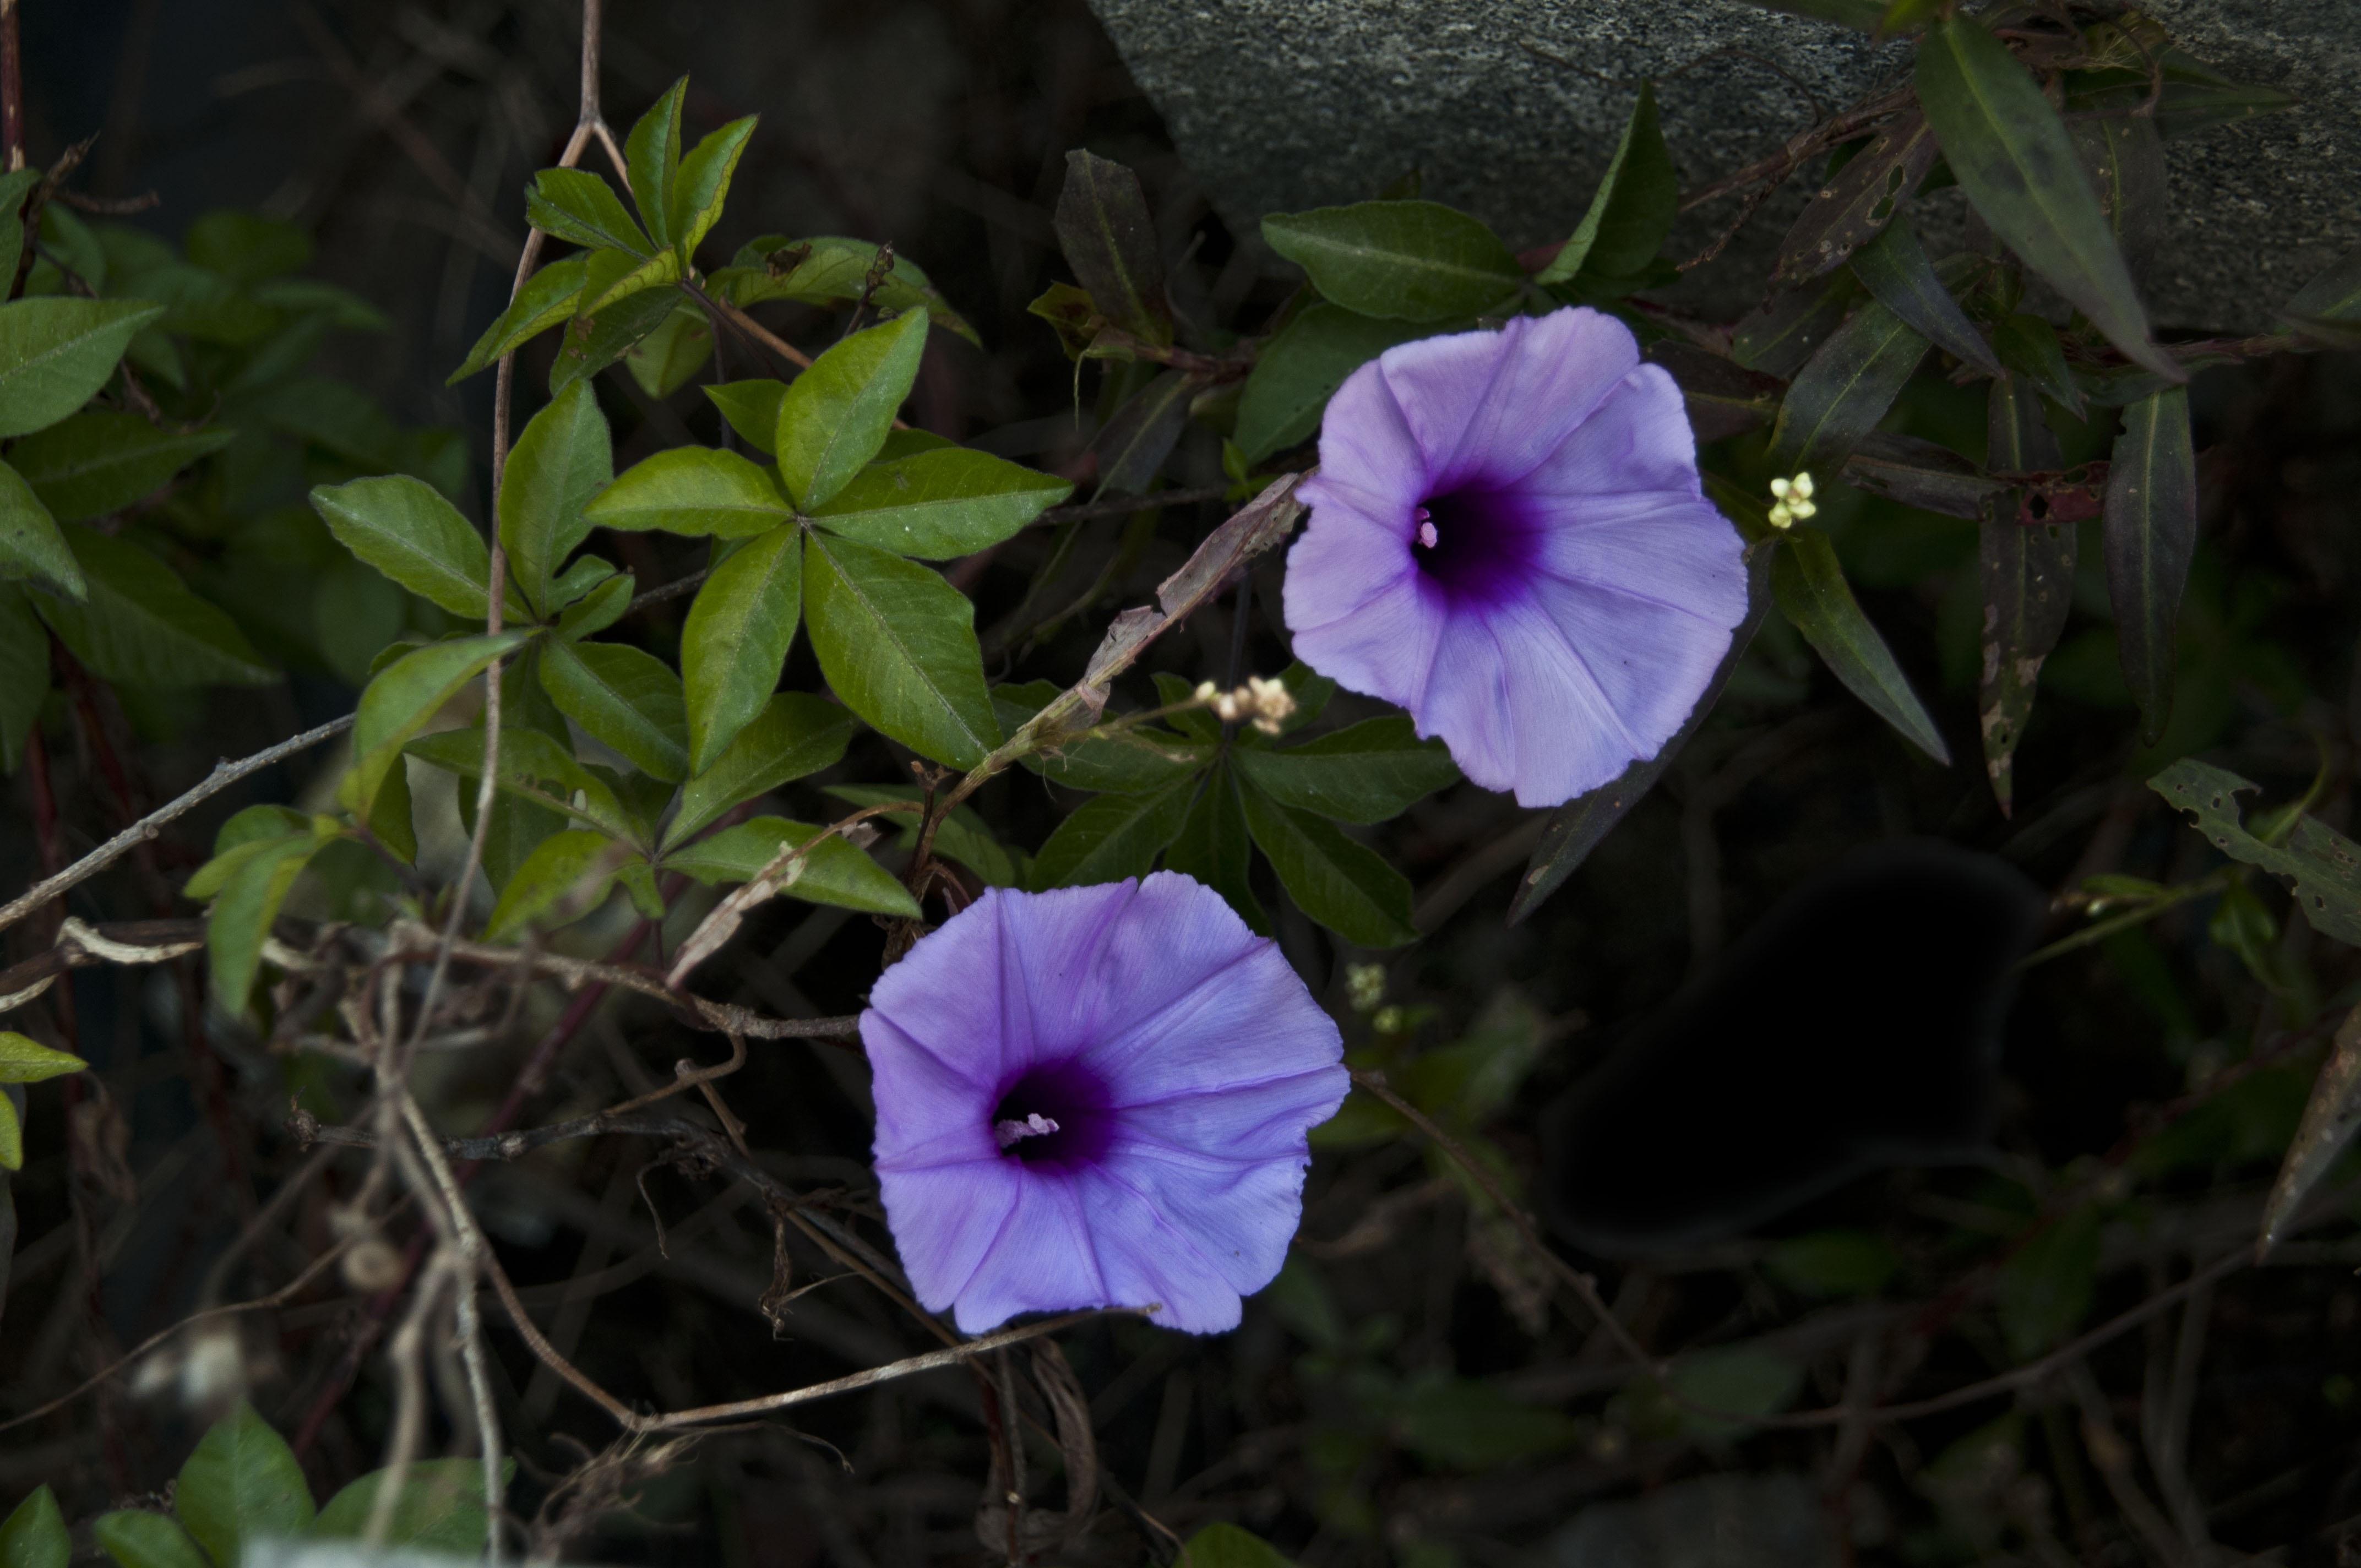 Plant Leaf Flower Petal Autumn Botany Flora Wildflower Morning Glory Flowering Macro Photography Annual